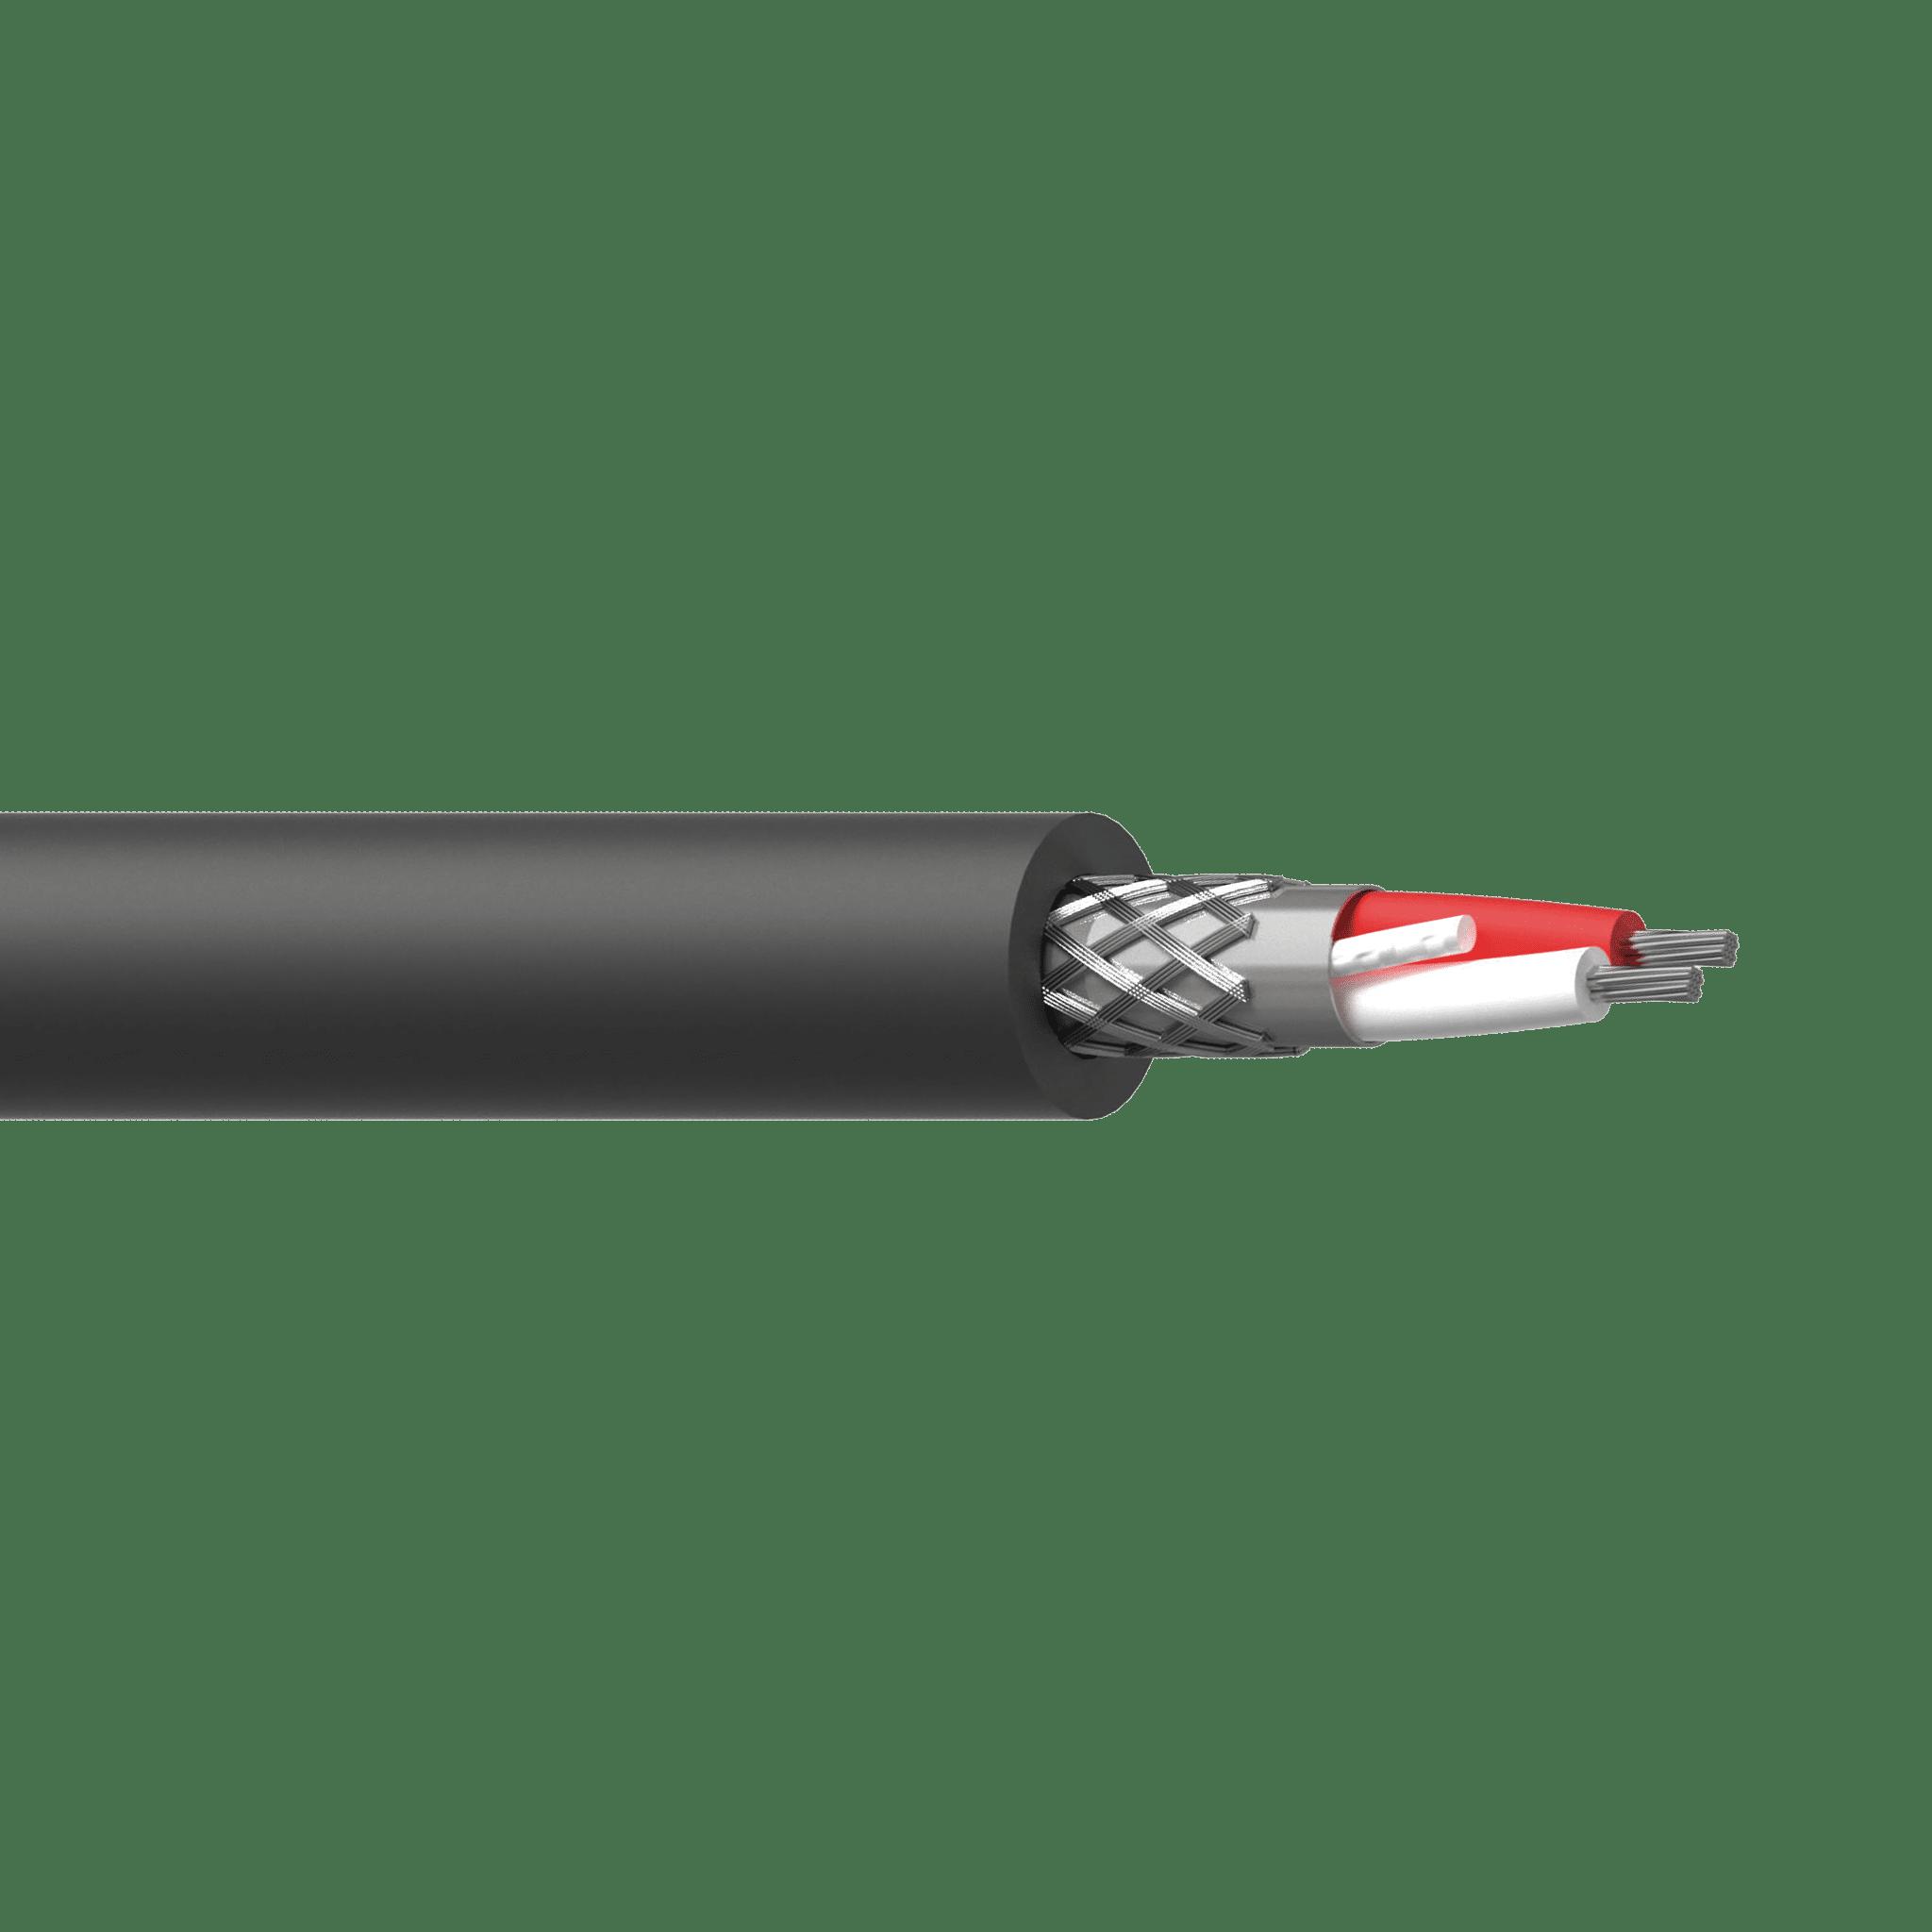 PMX222 - DMX-AES cable - flex 2 x 0.34 mm² - 22 AWG - HighFlex™